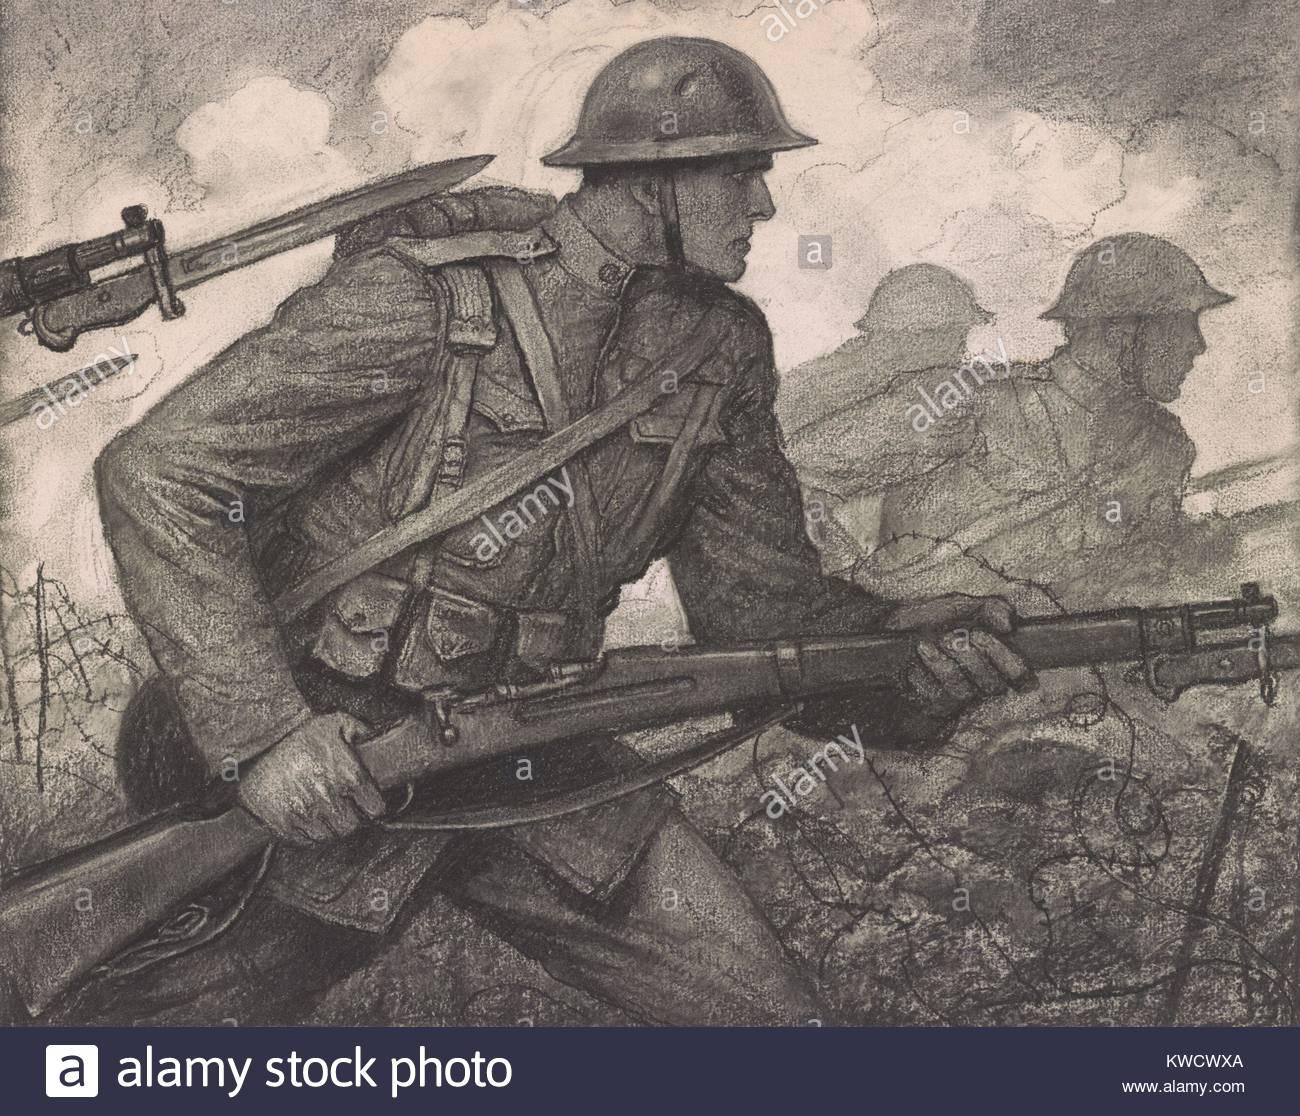 1300x1116 American Troops Ww1 1918 Stock Photos Amp American Troops Ww1 1918